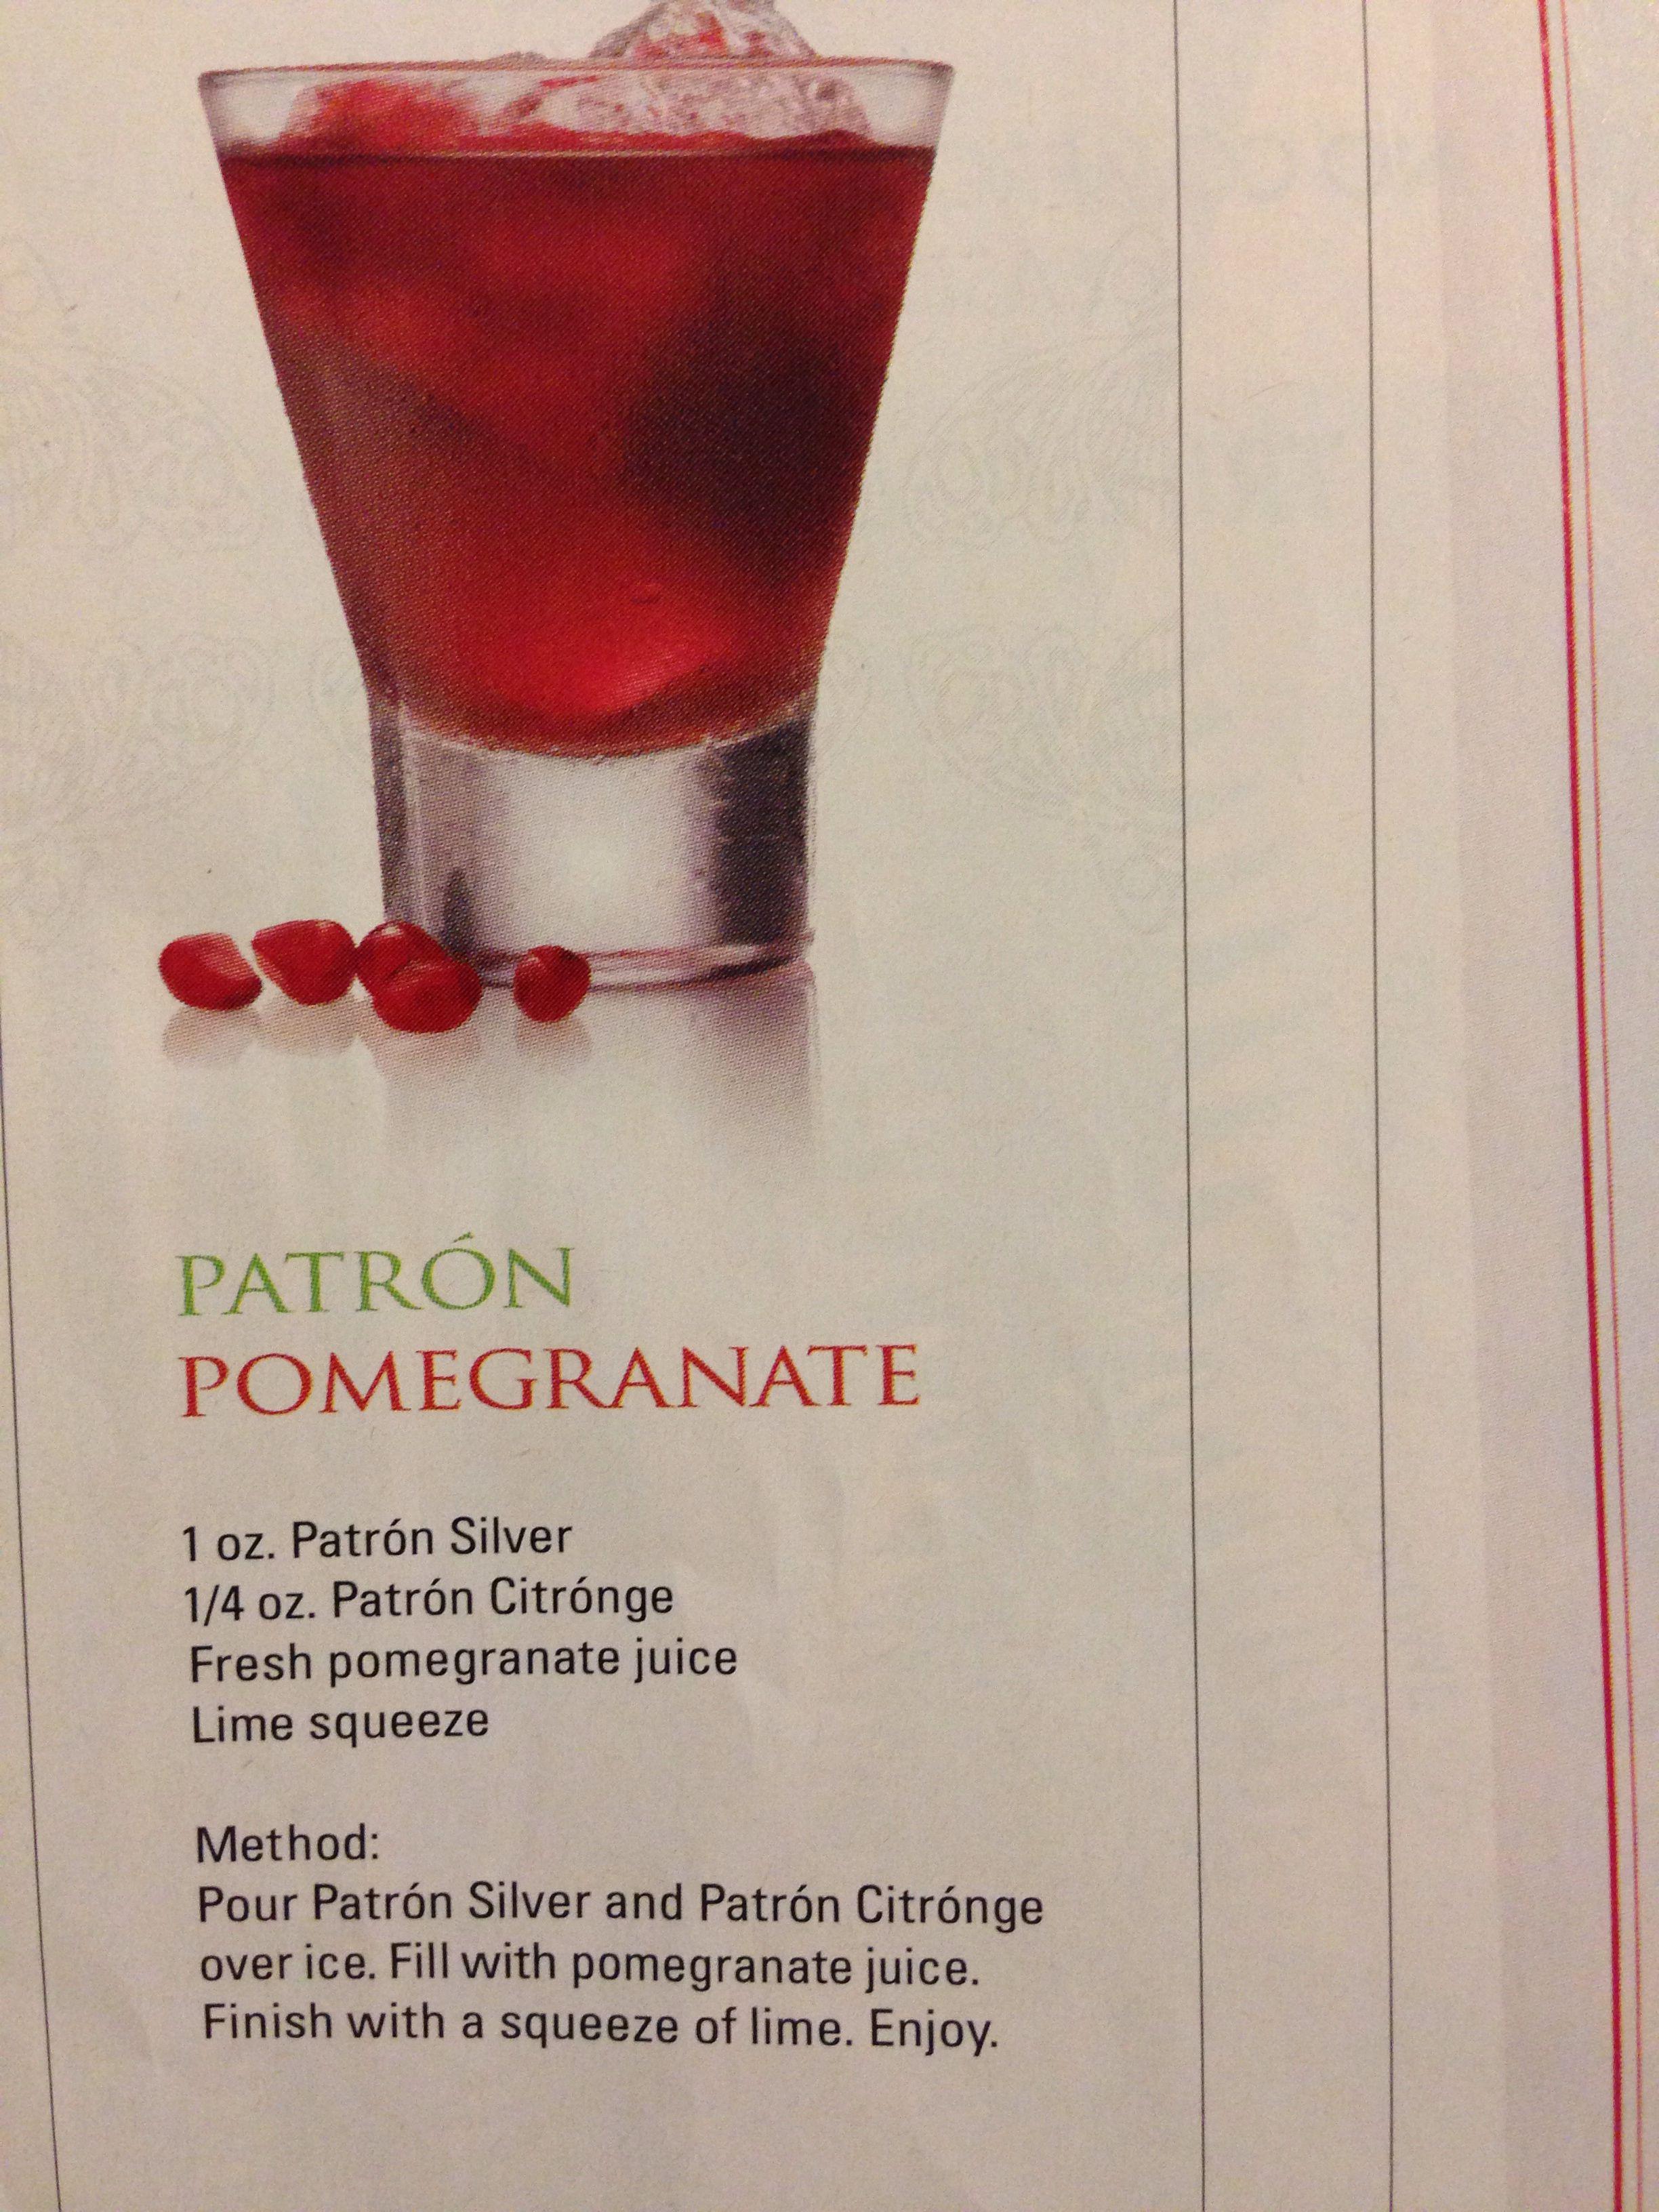 Patron pomegranate